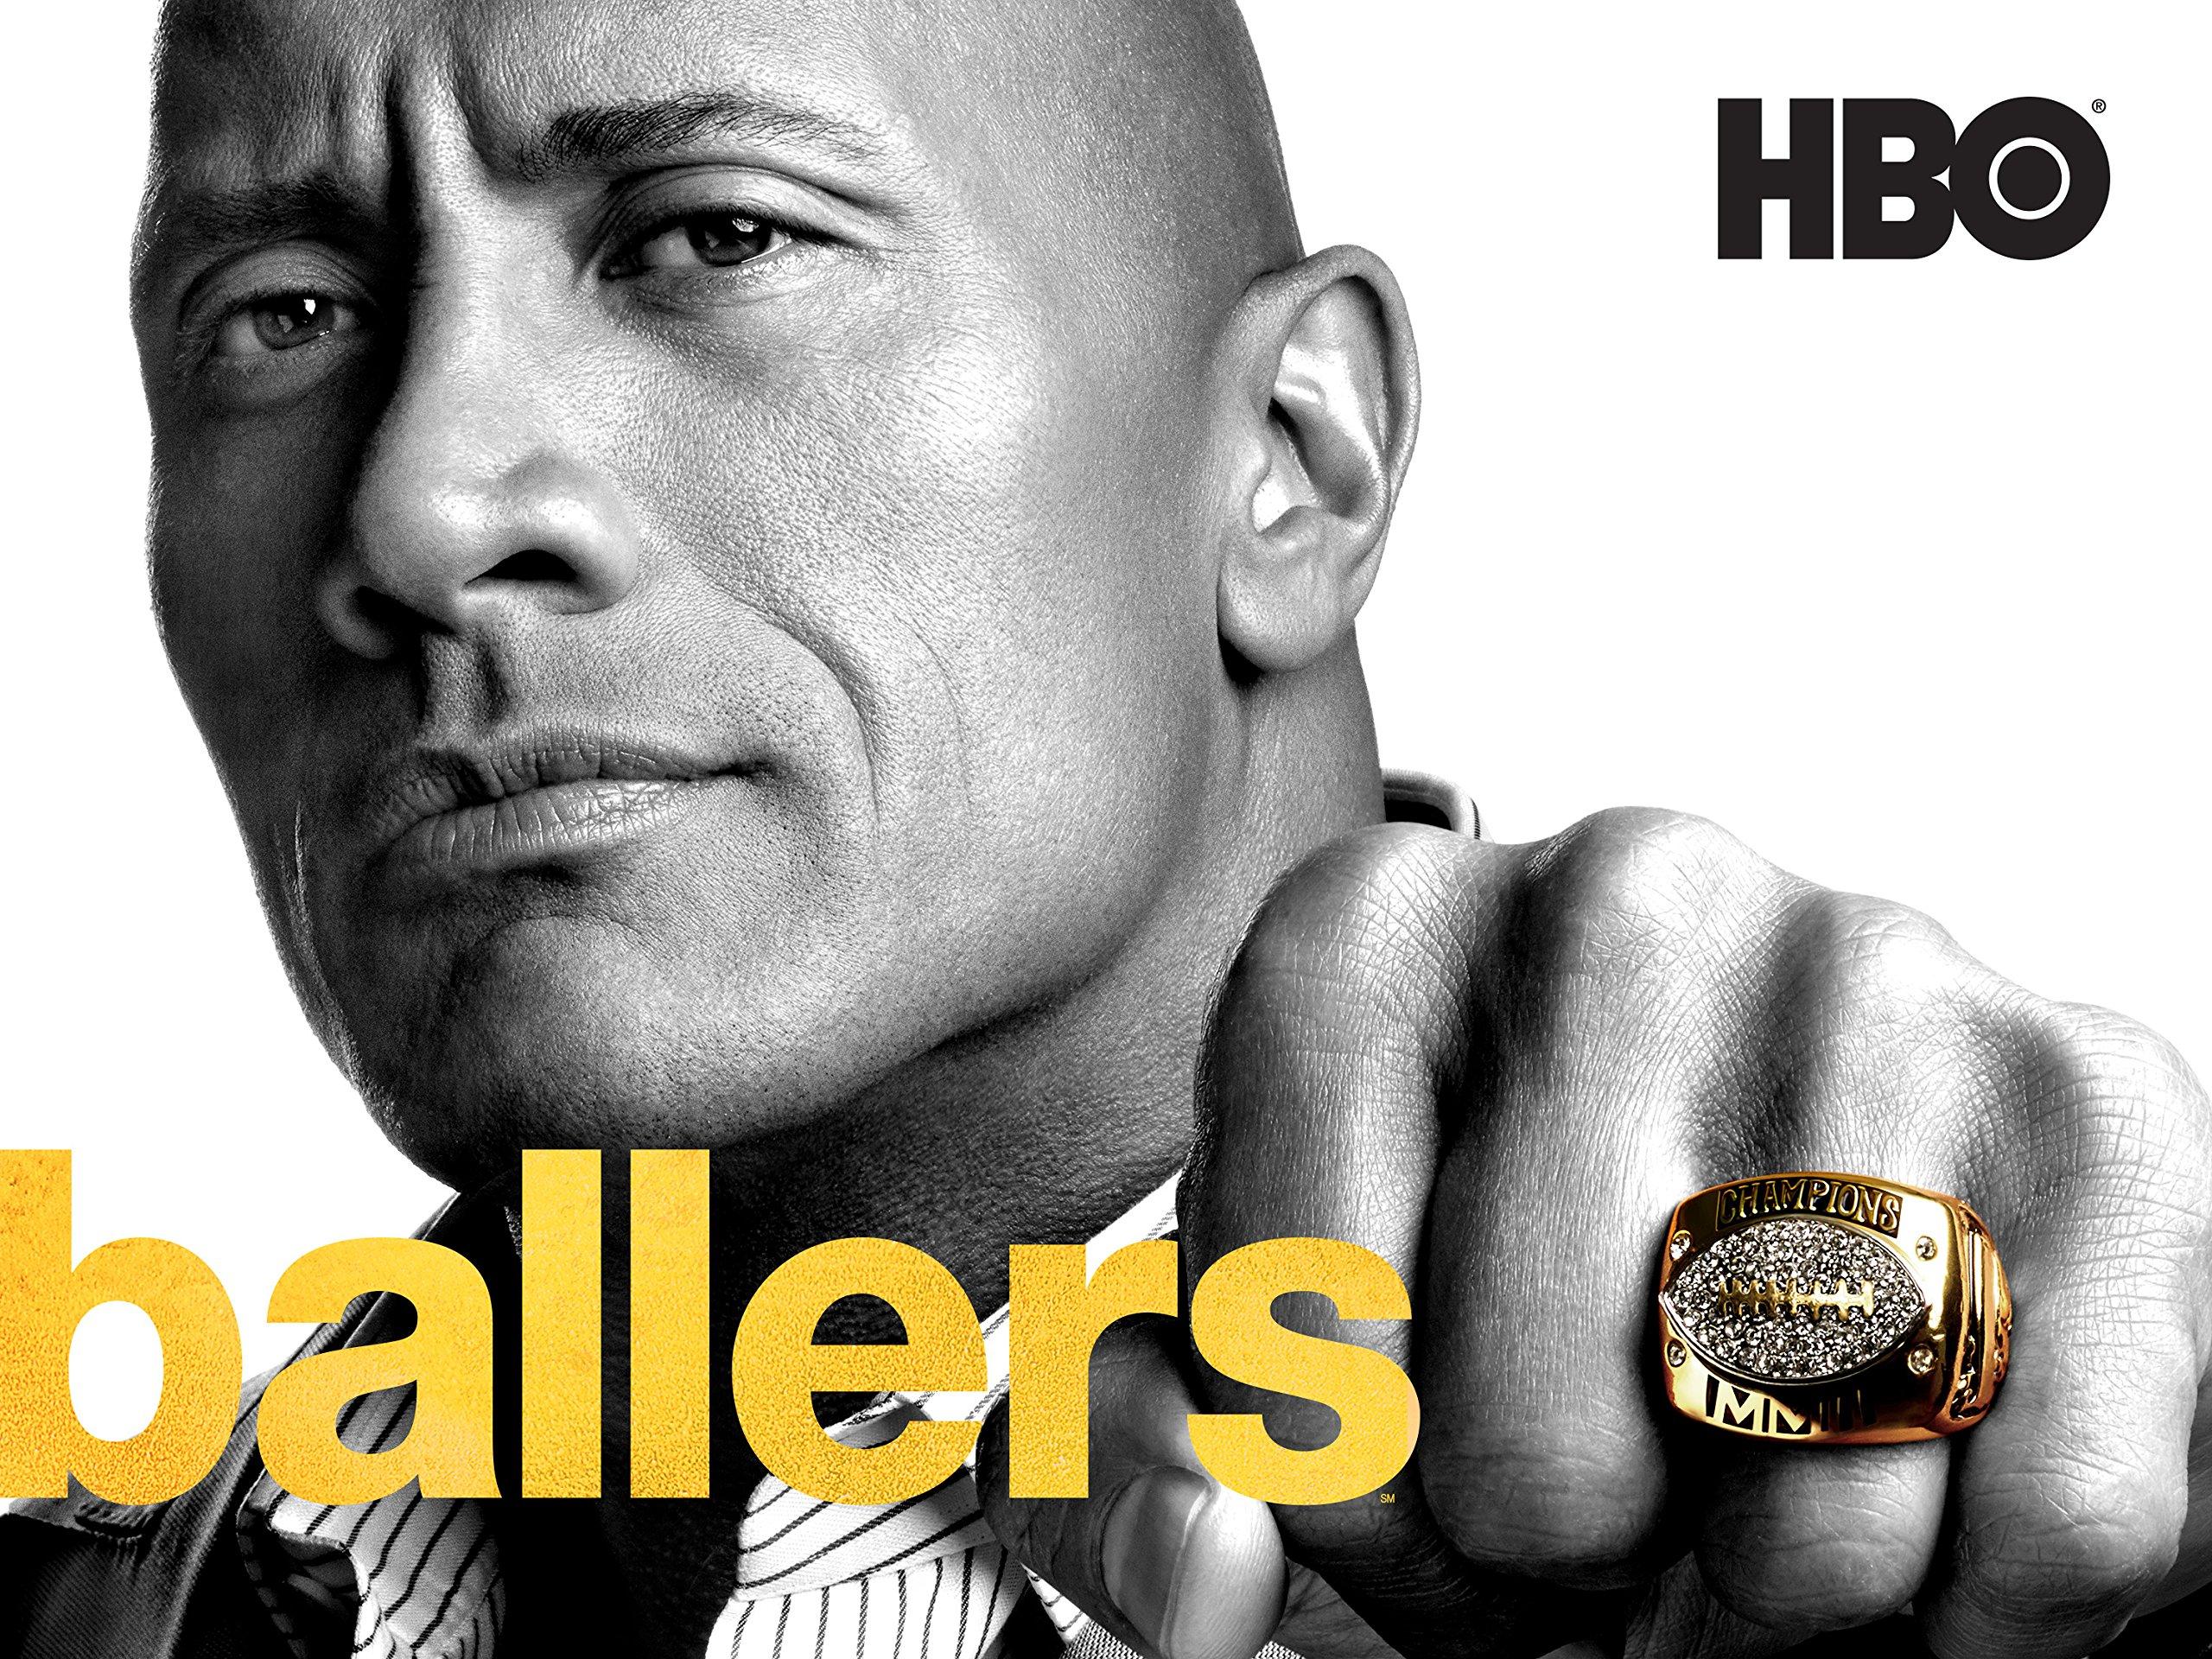 ballers season 2 episode 1 download